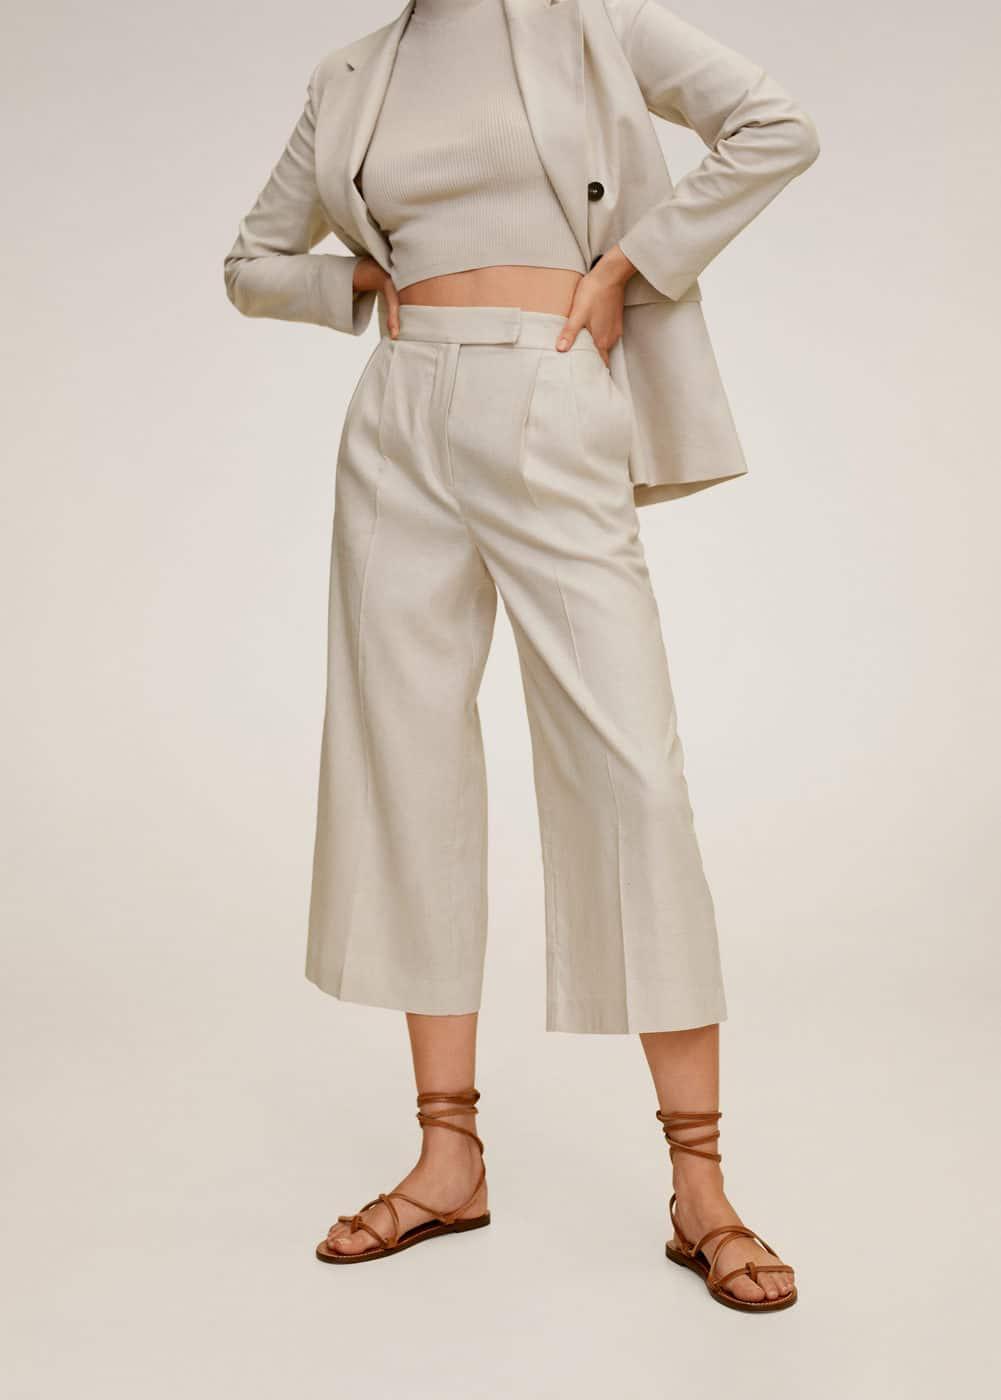 m-tempoli:pantalon culotte lino